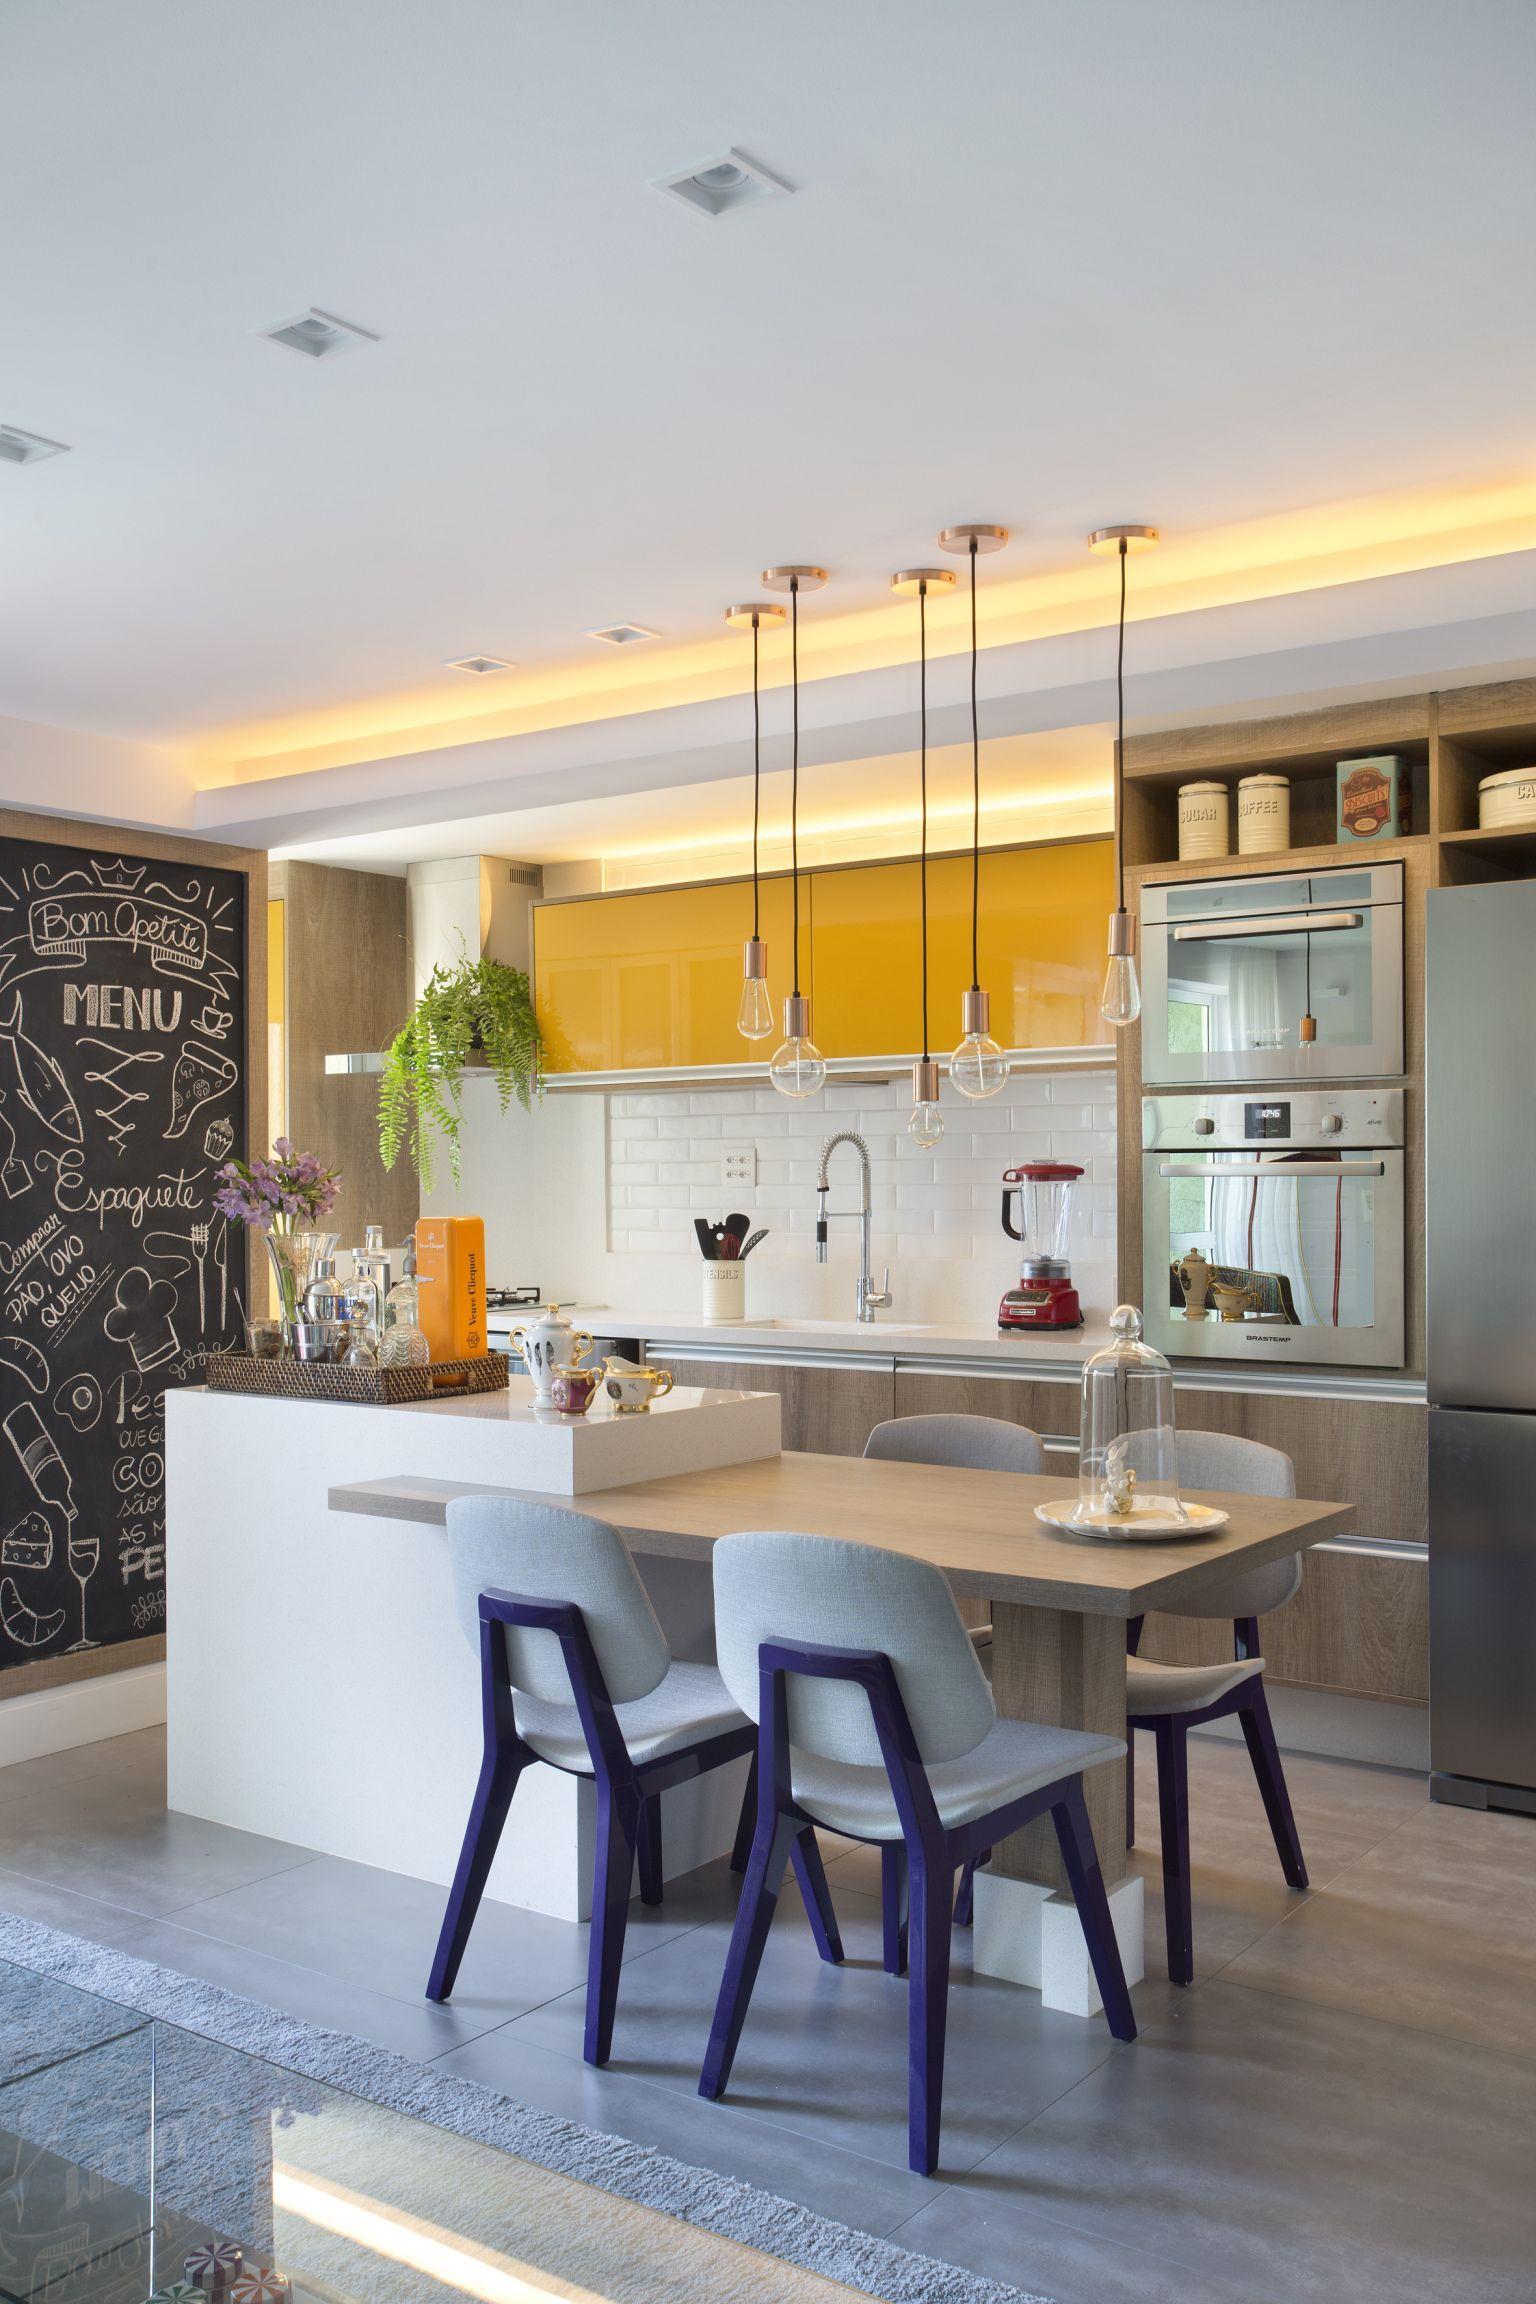 6 modern small kitchen ideas that will give a big impact on your daily mood konyhai ötletek on kitchen ideas modern id=15393